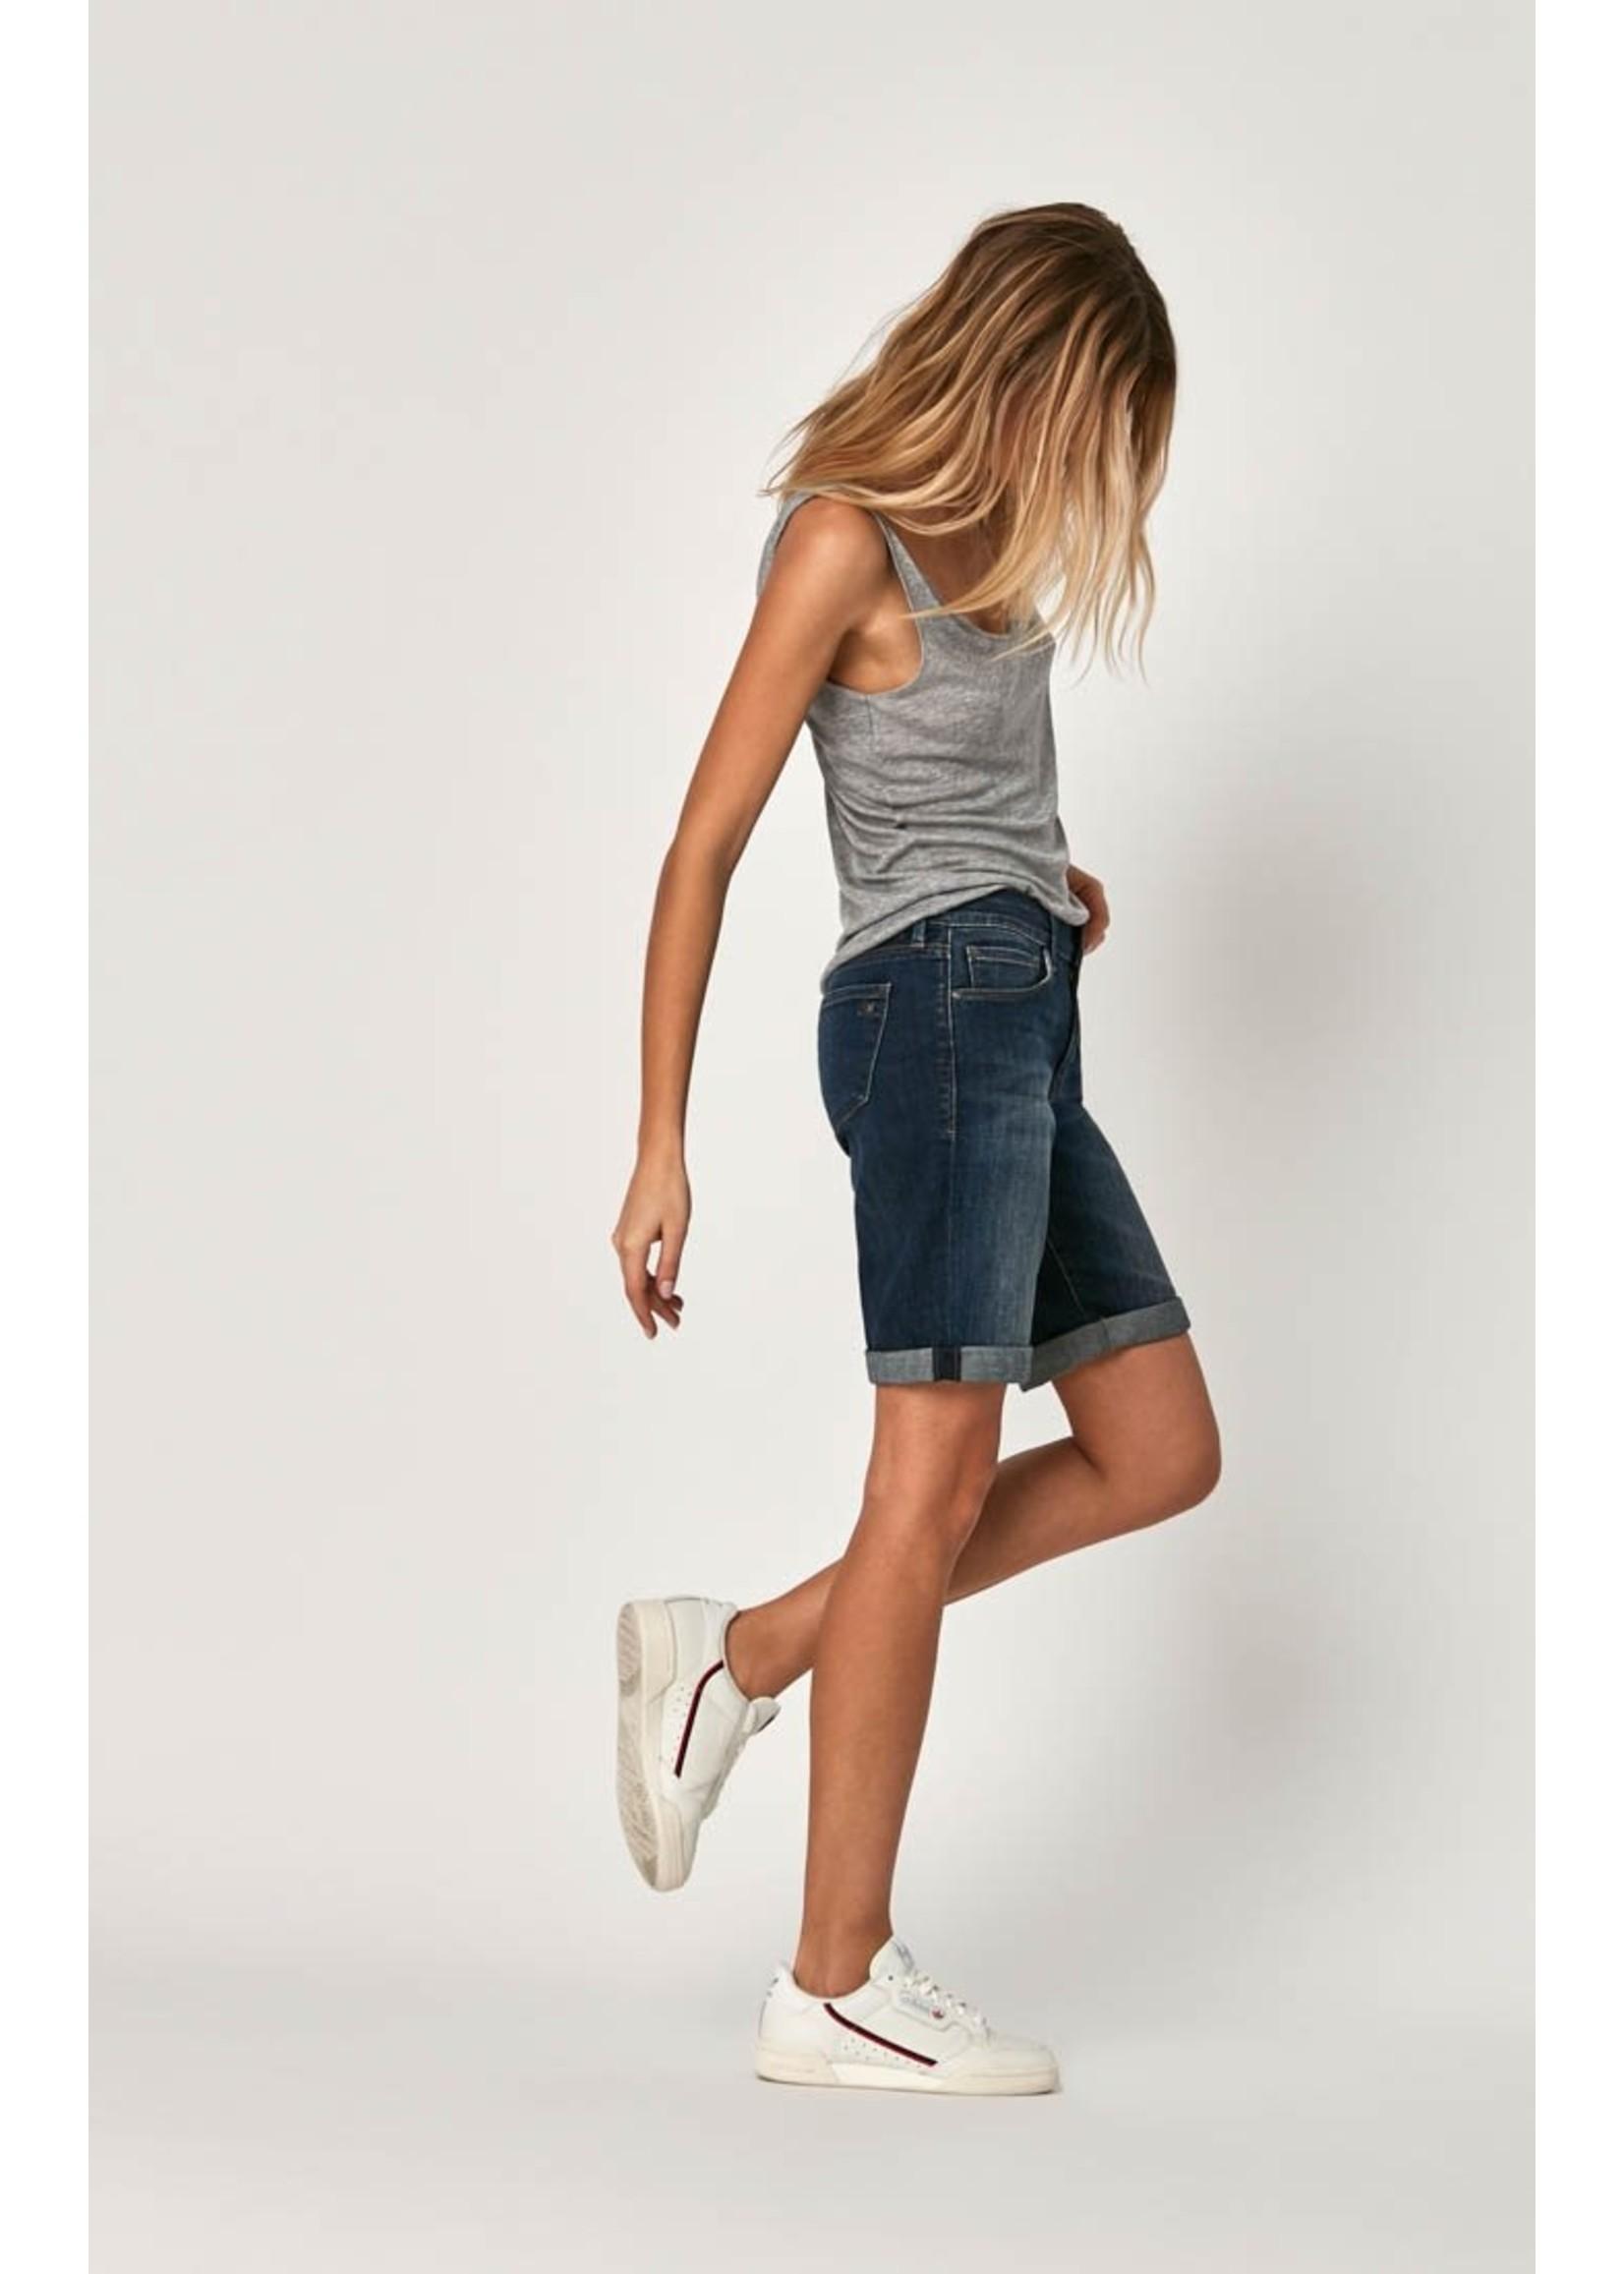 Mavi Jeans Alexis Dark Indigo Vintage